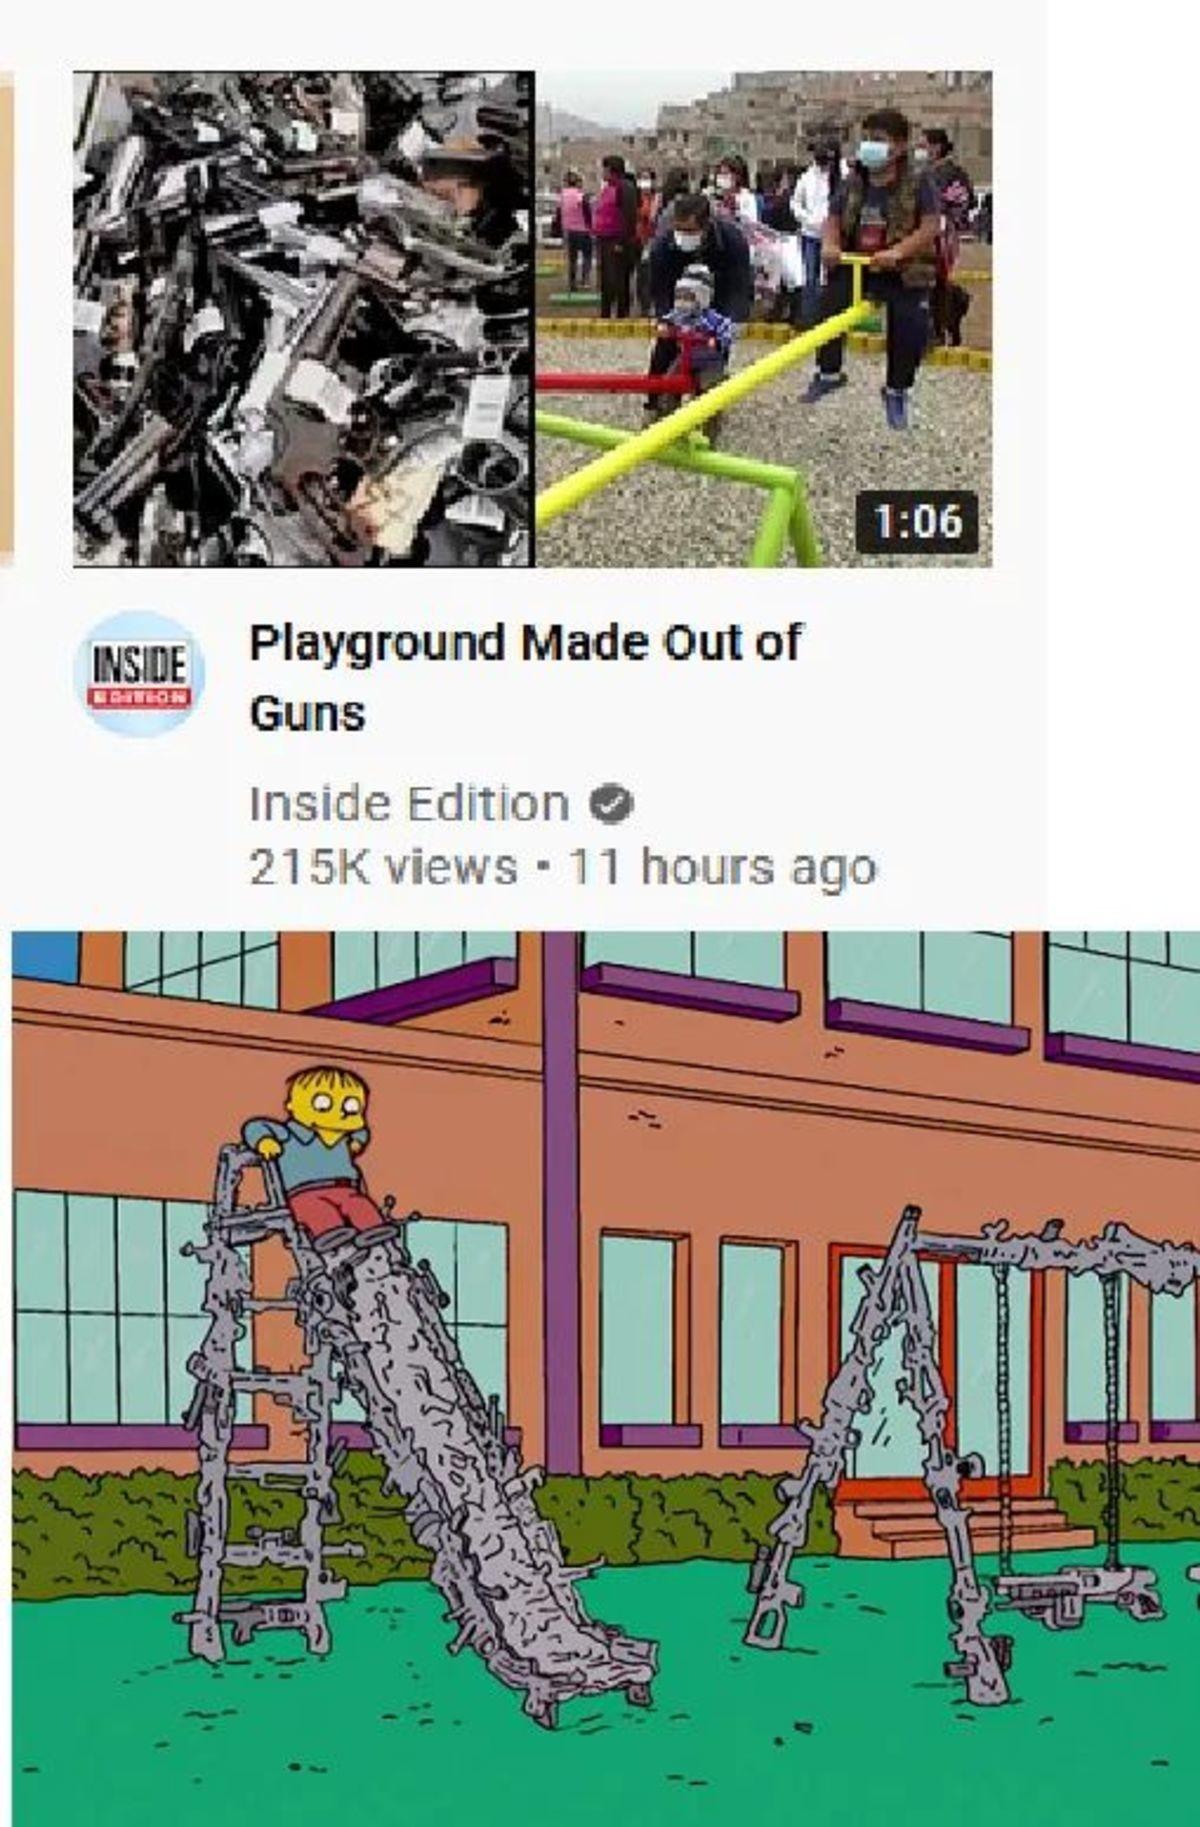 guns. .. What's Alec Baldwin doing at a children's playground?